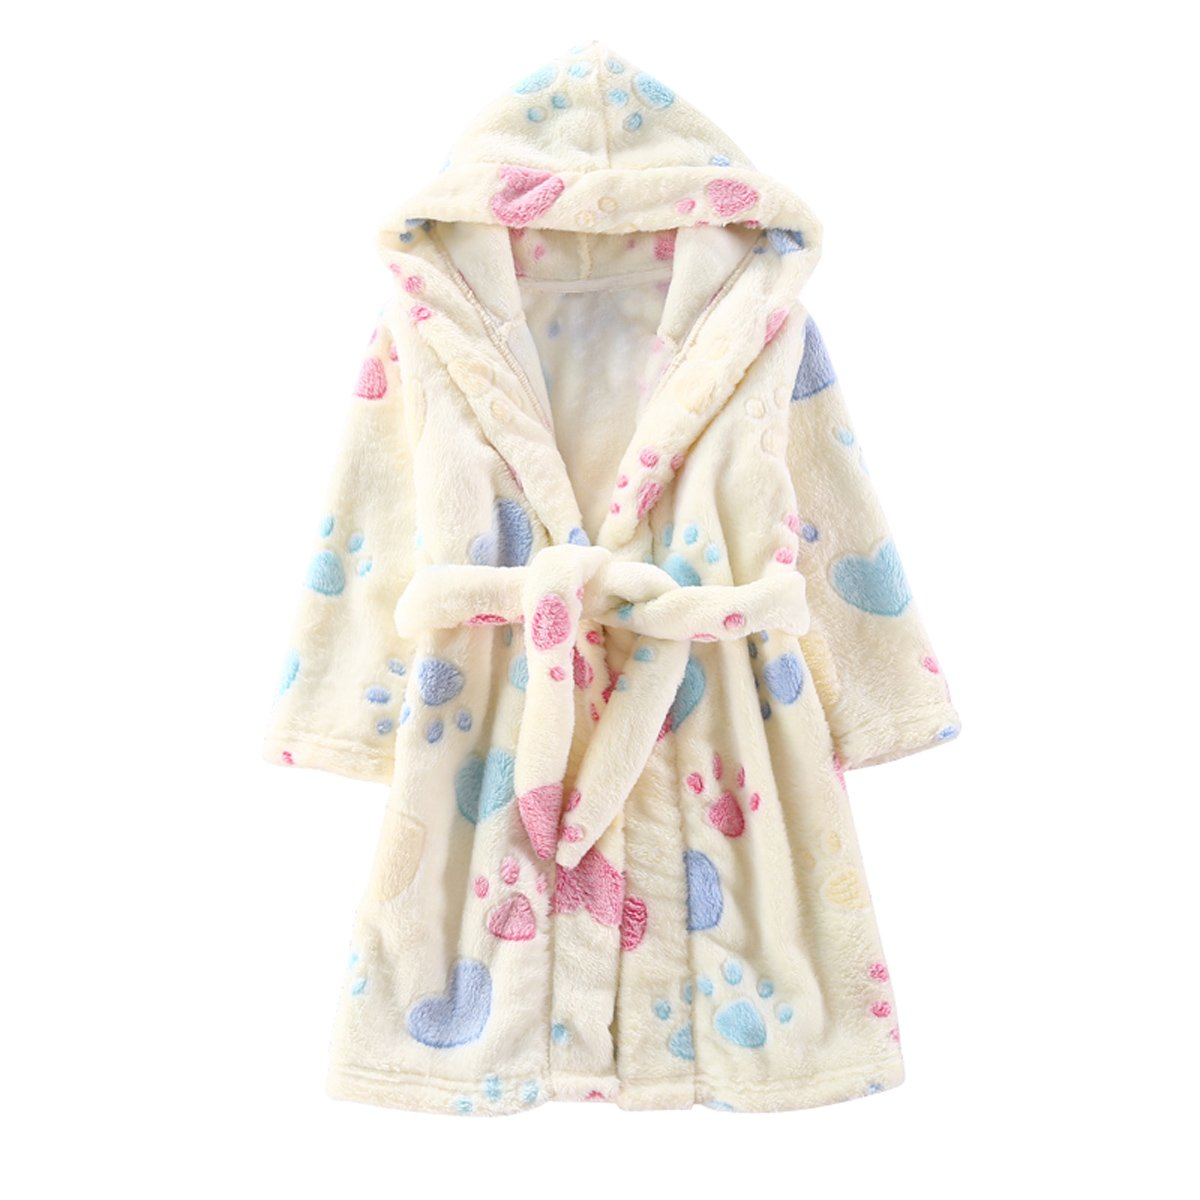 Toddlers/kids/baby Soft Fleece Bath Robe Children Pajamas Sleepwear With Hood (3T, Yellow)